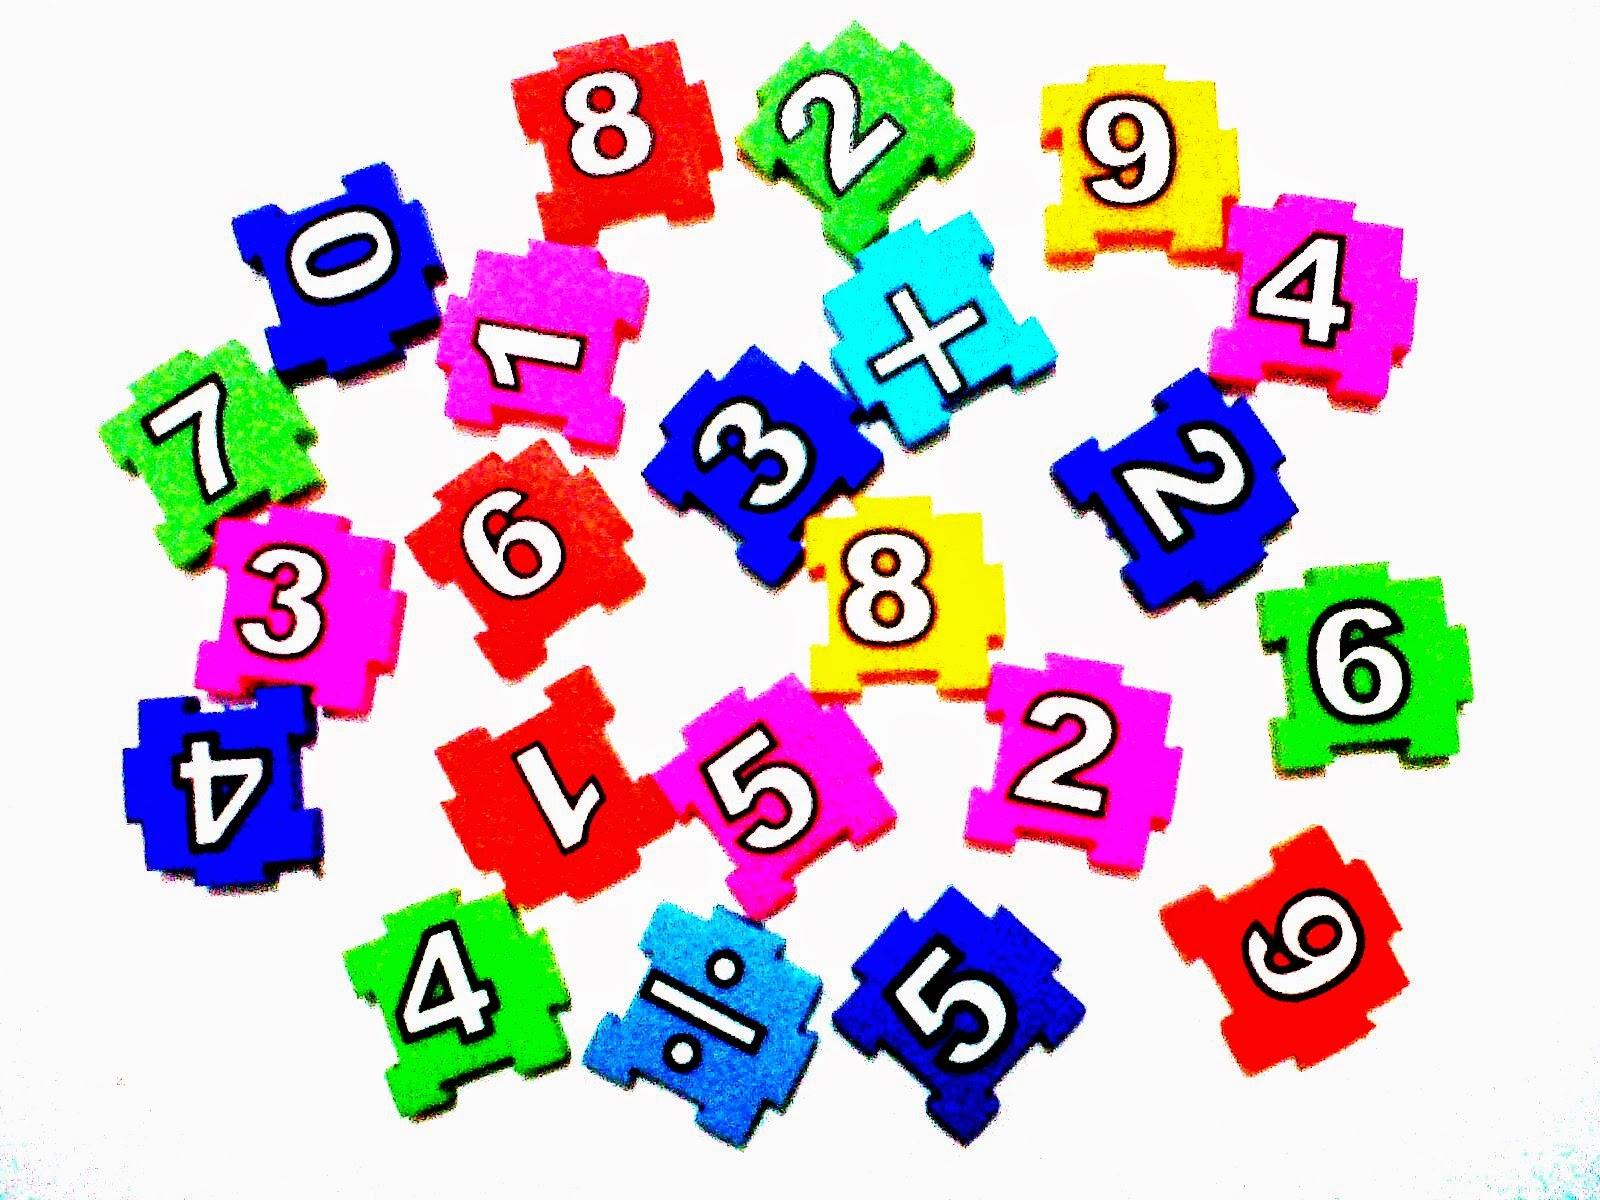 Contoh Permainan Matematika Untuk Anak Usia Dini Icefilmsinfo Globolister Pada Anak Dengan Model Make A Match Anak Paud Bermain Belajar